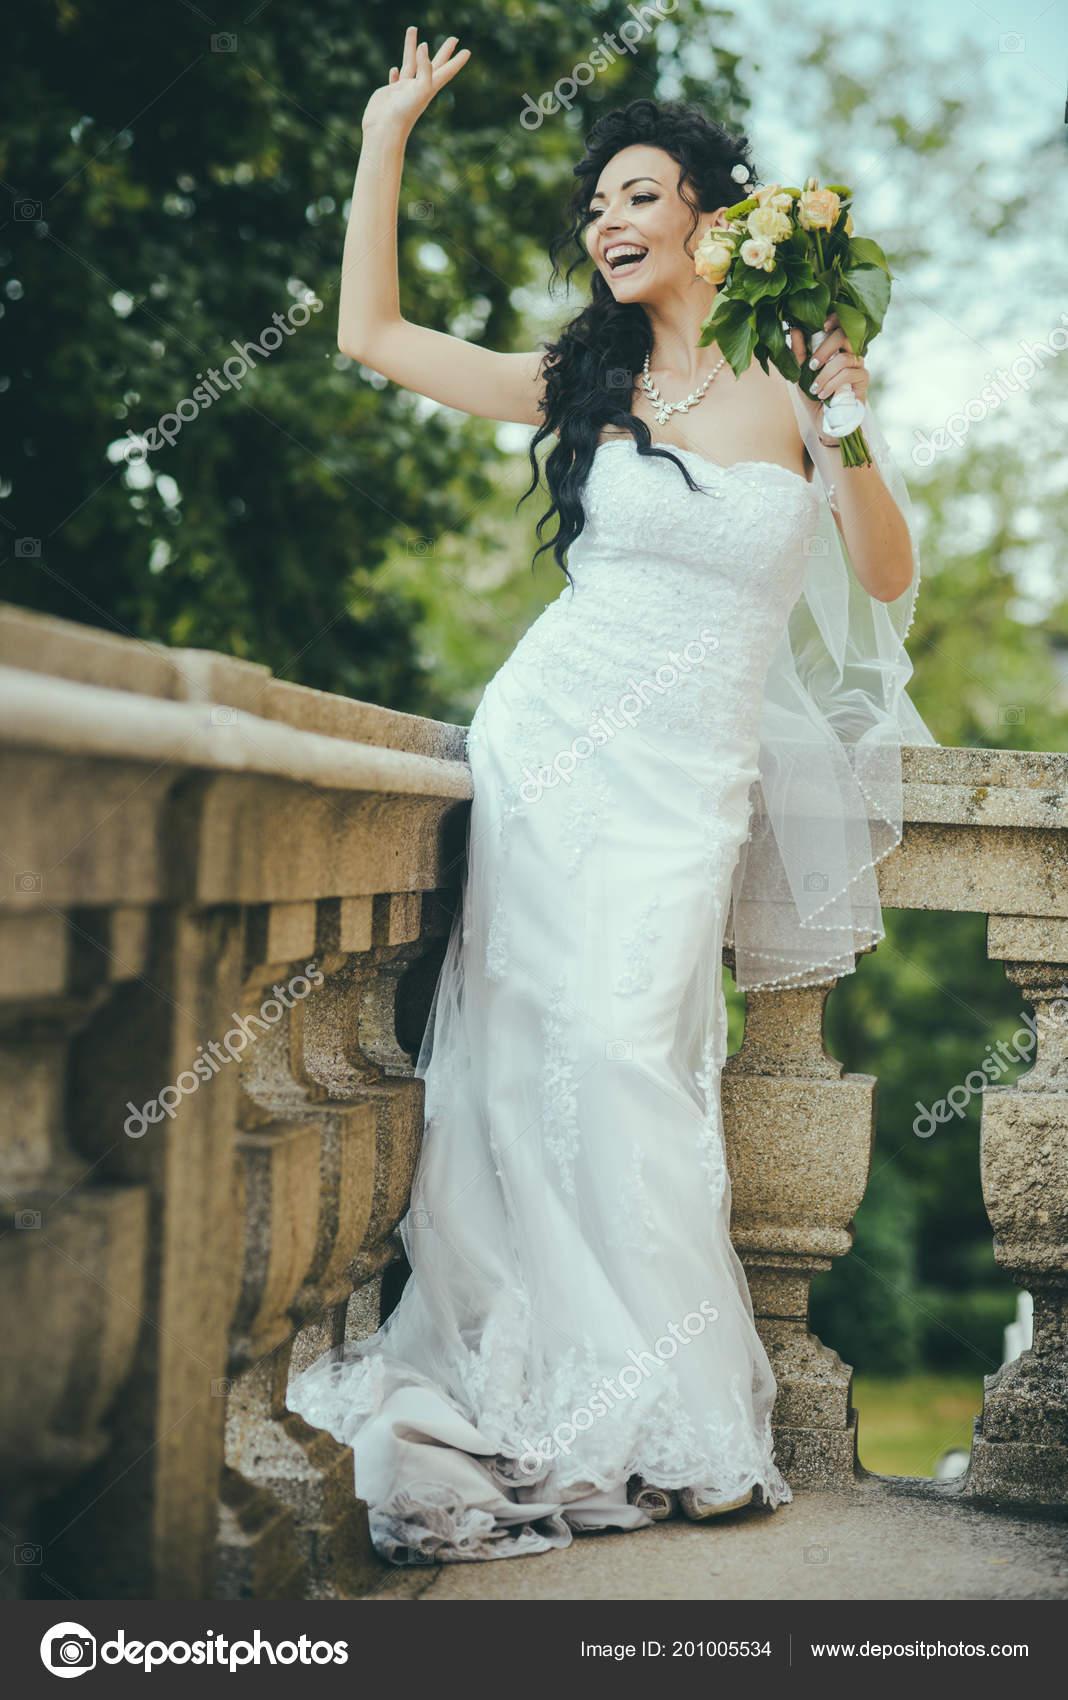 87ecdf915b88 Γυναίκα ομορφιά με γαμήλια ανθοδέσμη στο μπαλκόνι. Ομορφιά κορίτσι με το  νυφικό μακιγιάζ και χτένισμα σε λευκό φόρεμα– εικόνα αρχείου